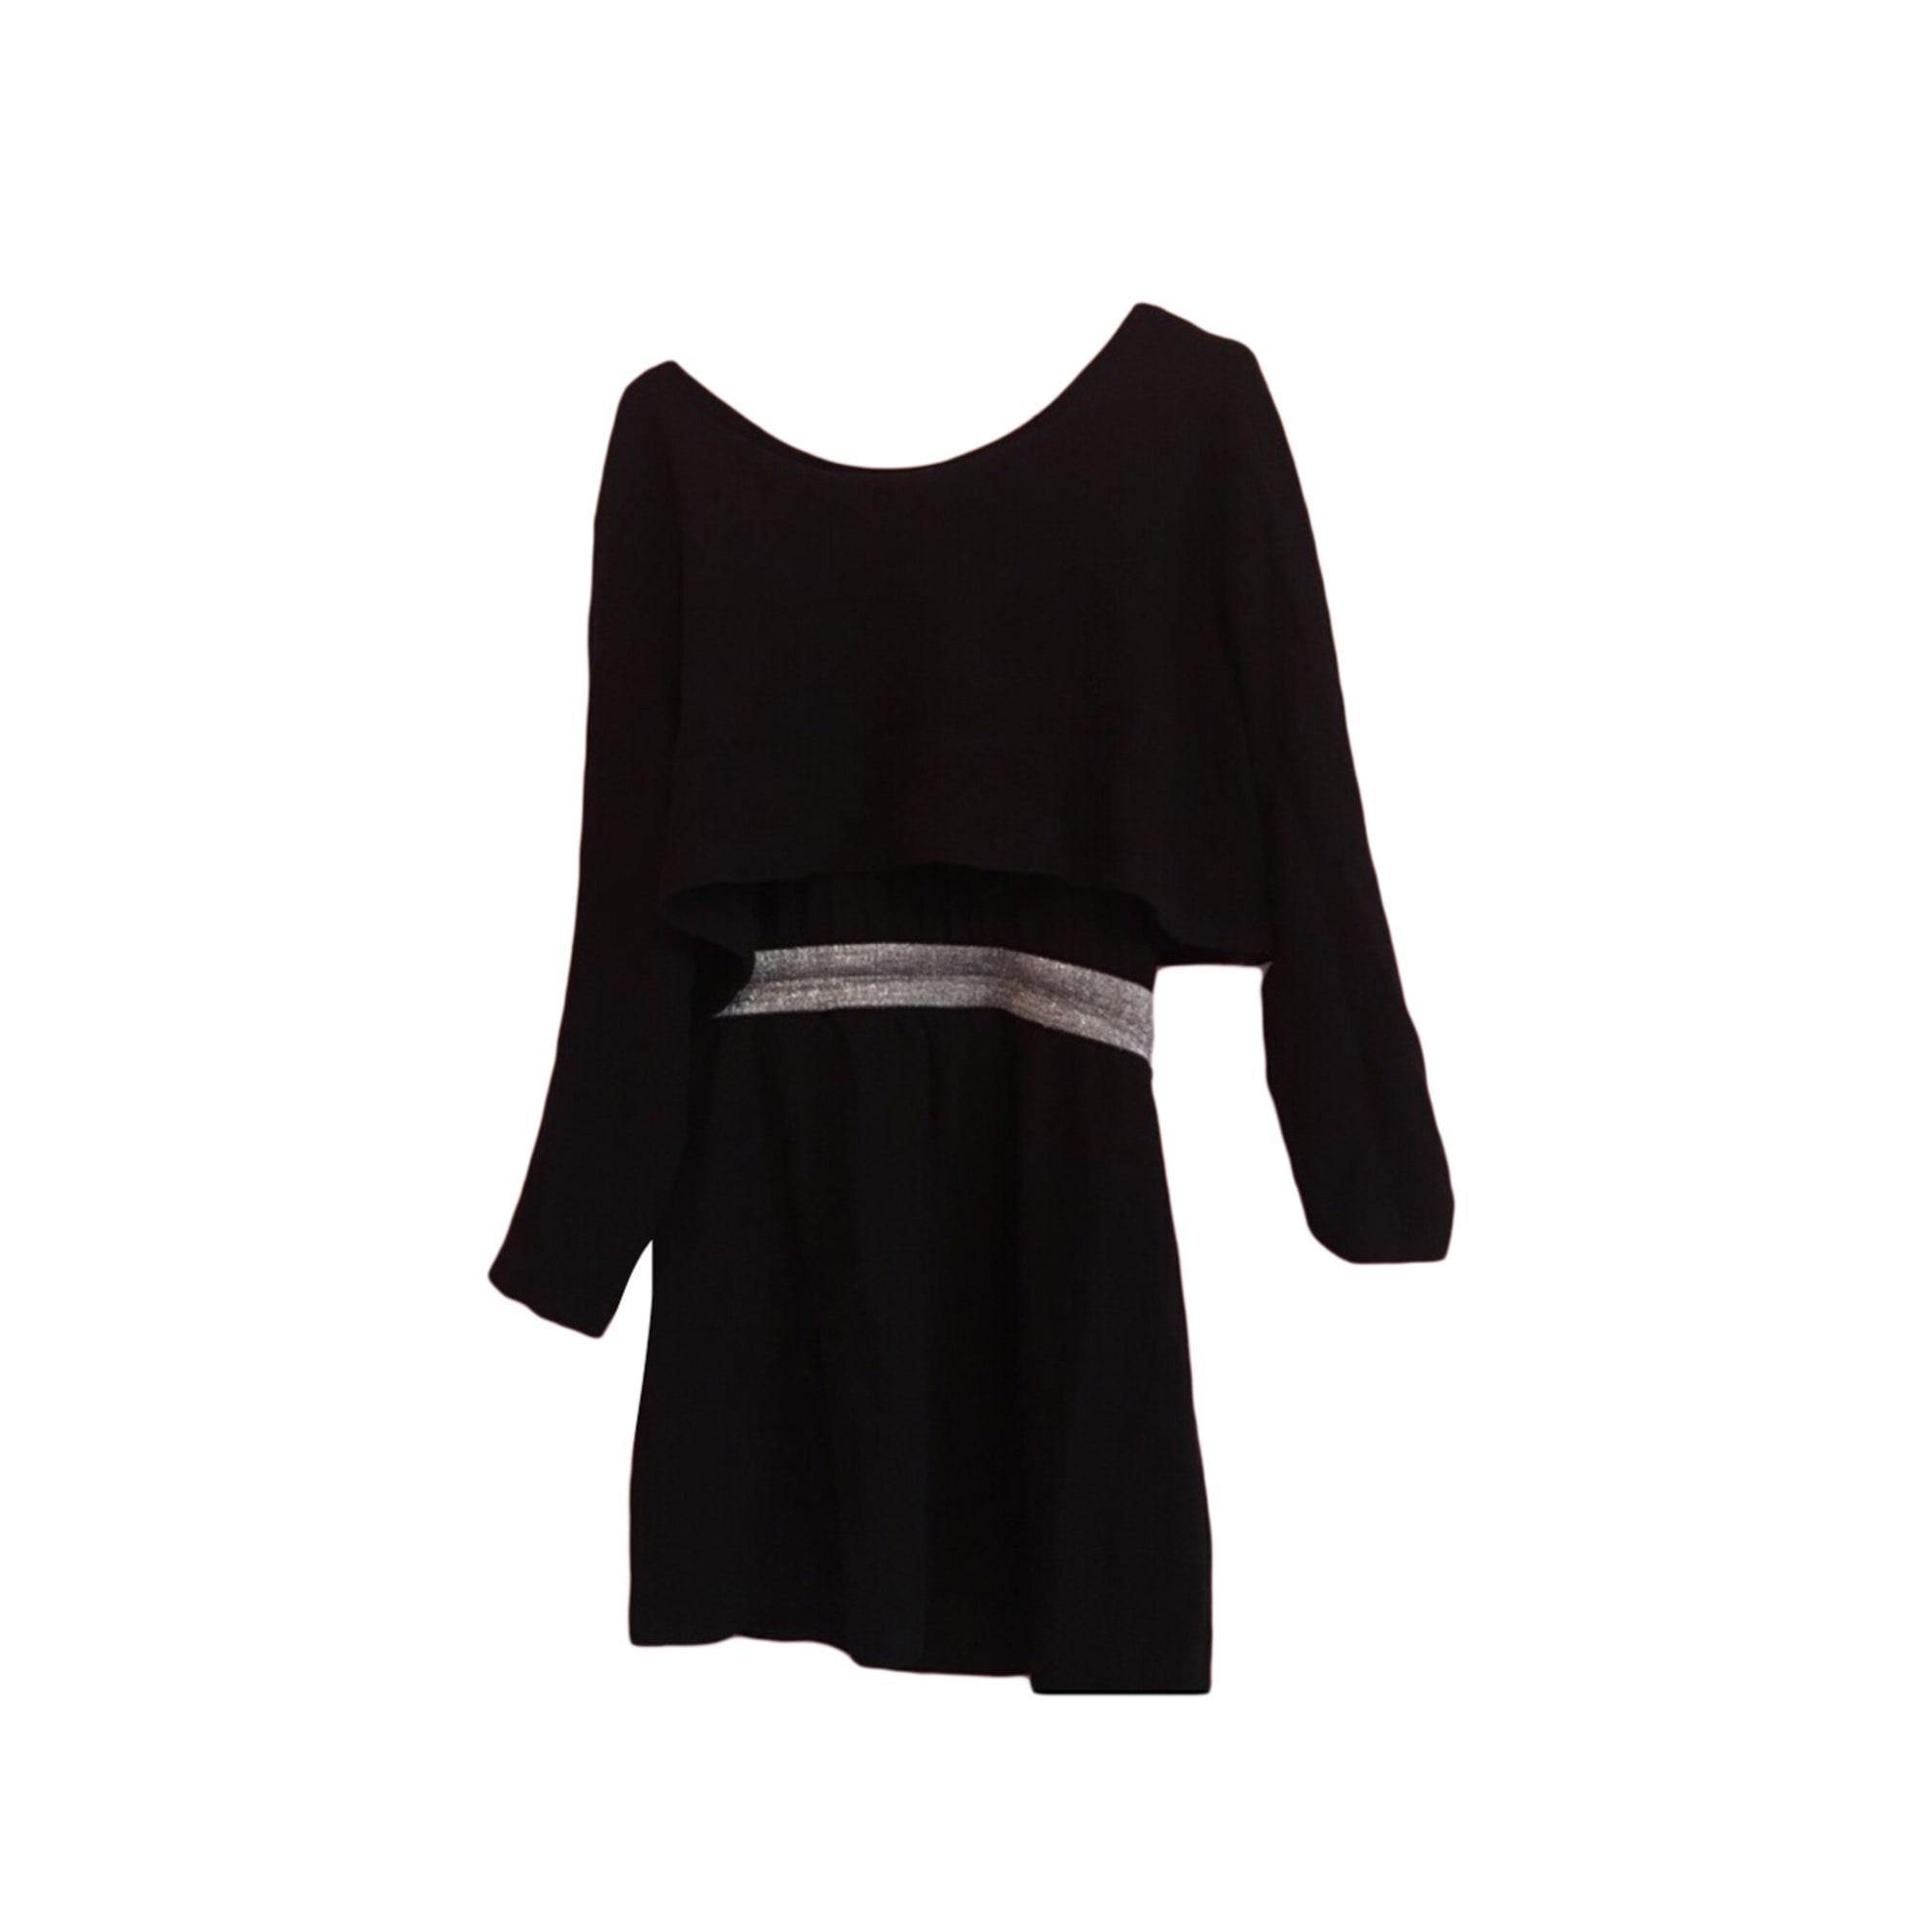 Claudie T3 Courte Robe 7701684 Pierlot l Noir 40 58w1w